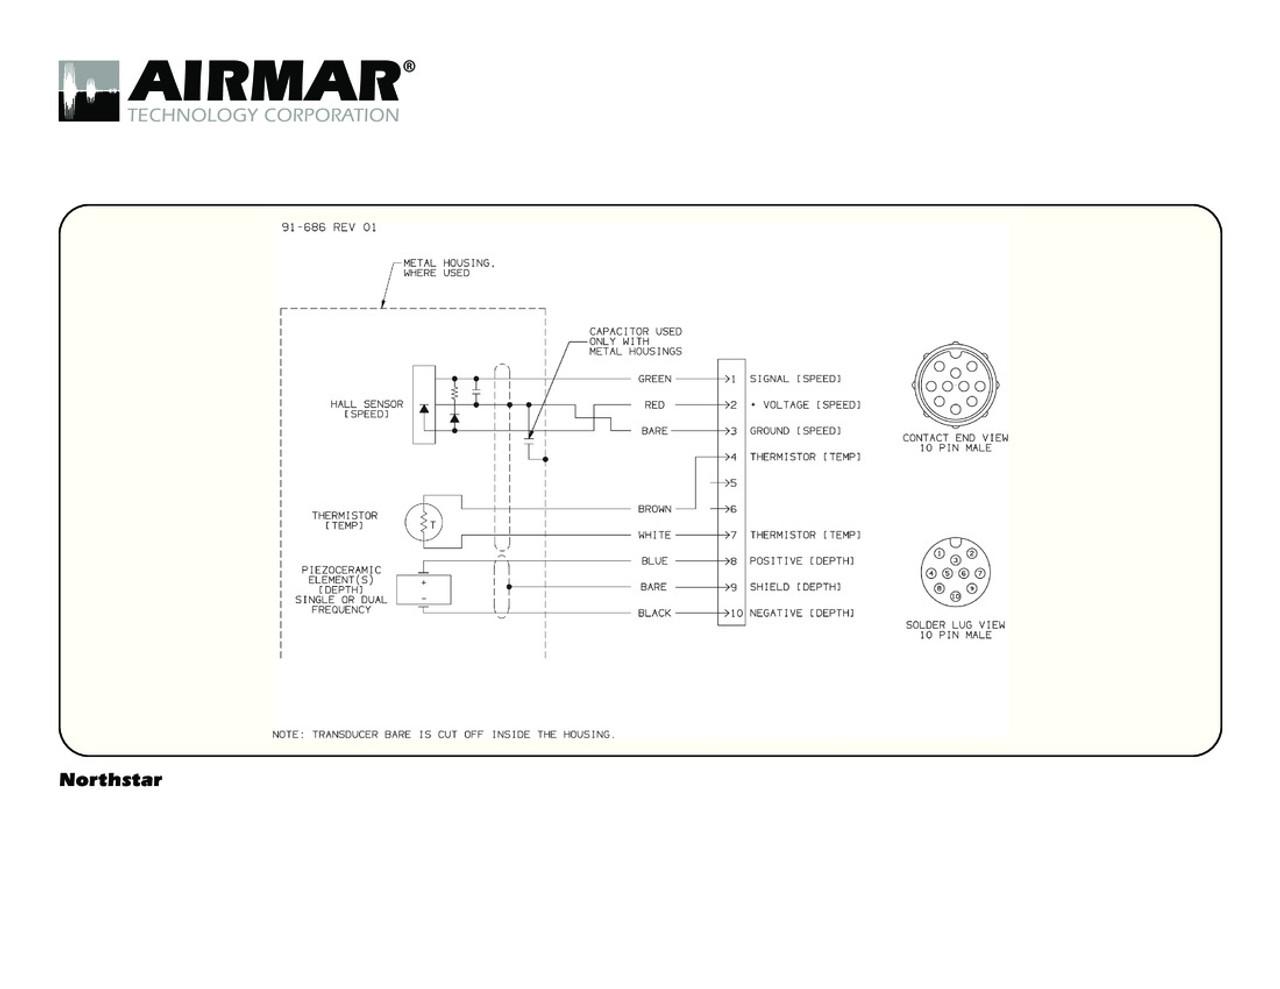 [SCHEMATICS_4FR]  WRG-0626] 10 Pin Connector Wiring Diagram | 2015 Polaris North Star Wiring Diagram |  | henrygreatshowrooms280718.mx.tl